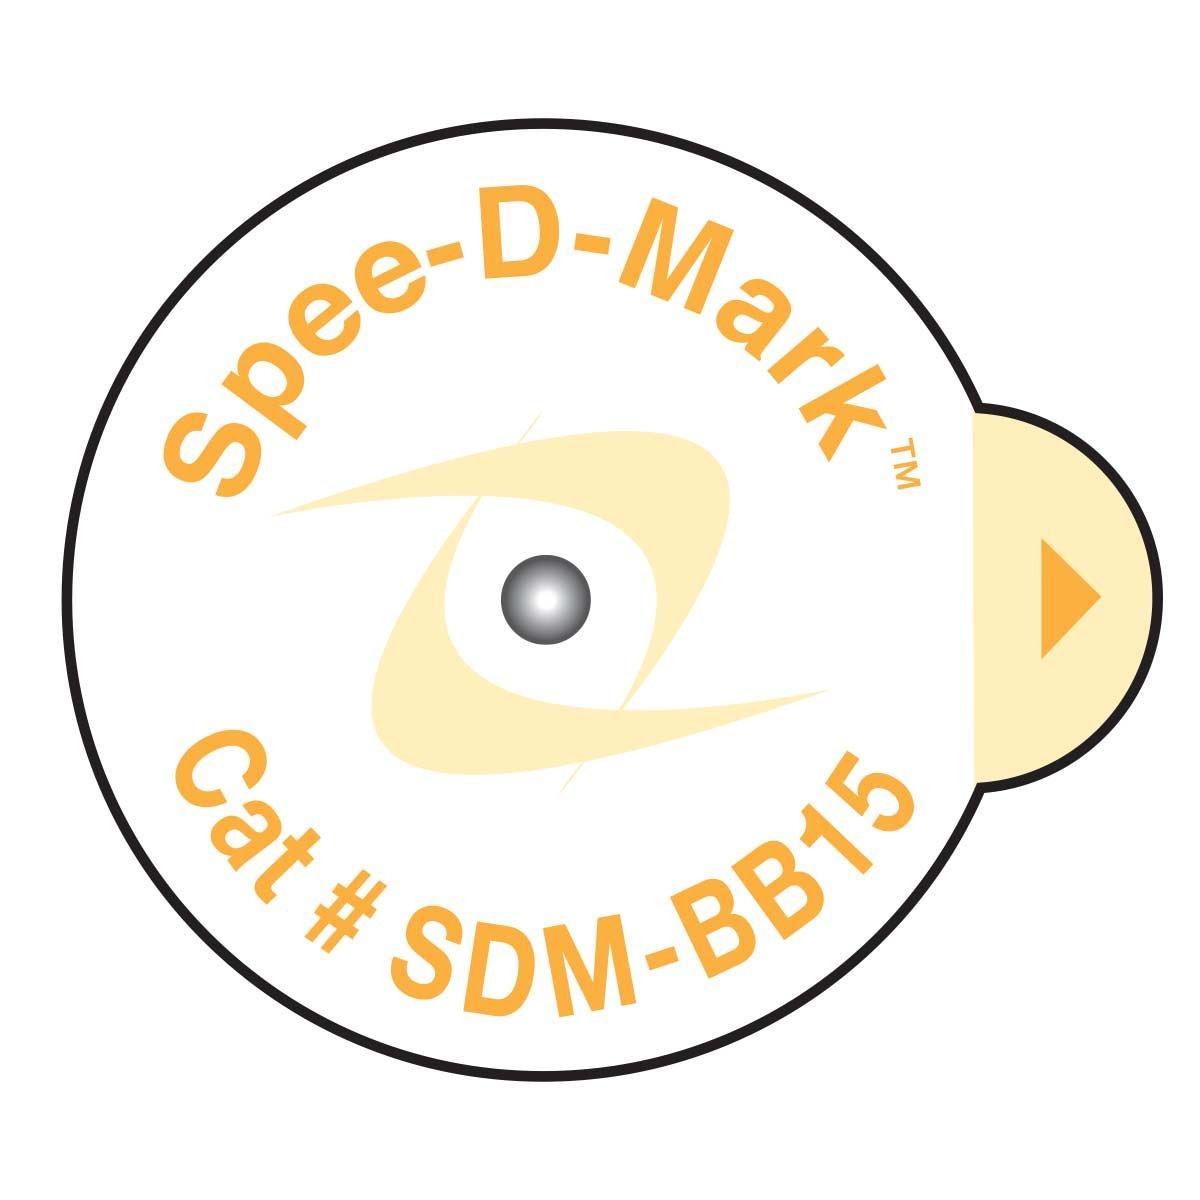 Spee-D-Mark SDM-BB15 Mammography Skin Marker Nipple Radiopaque, 1.5 mm Size (Box of 100)